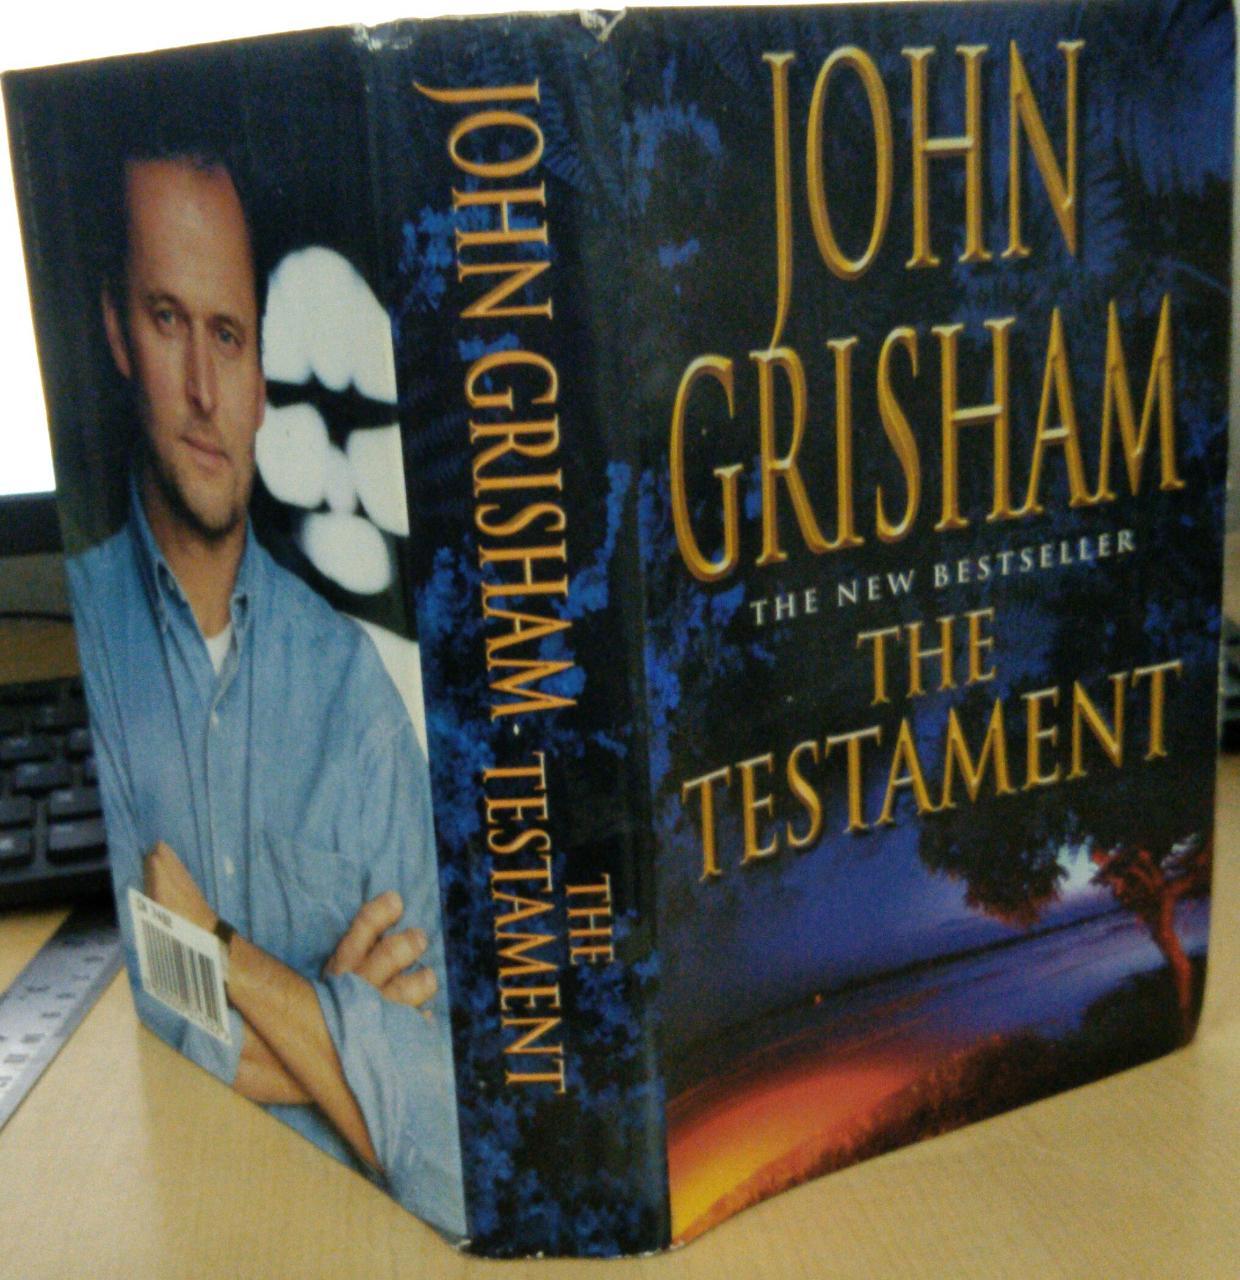 Buy THE TESTAMENT BY JOHN GRISHAM-Hardcover by John Grisham online in india - Bookchor | 9781310390040